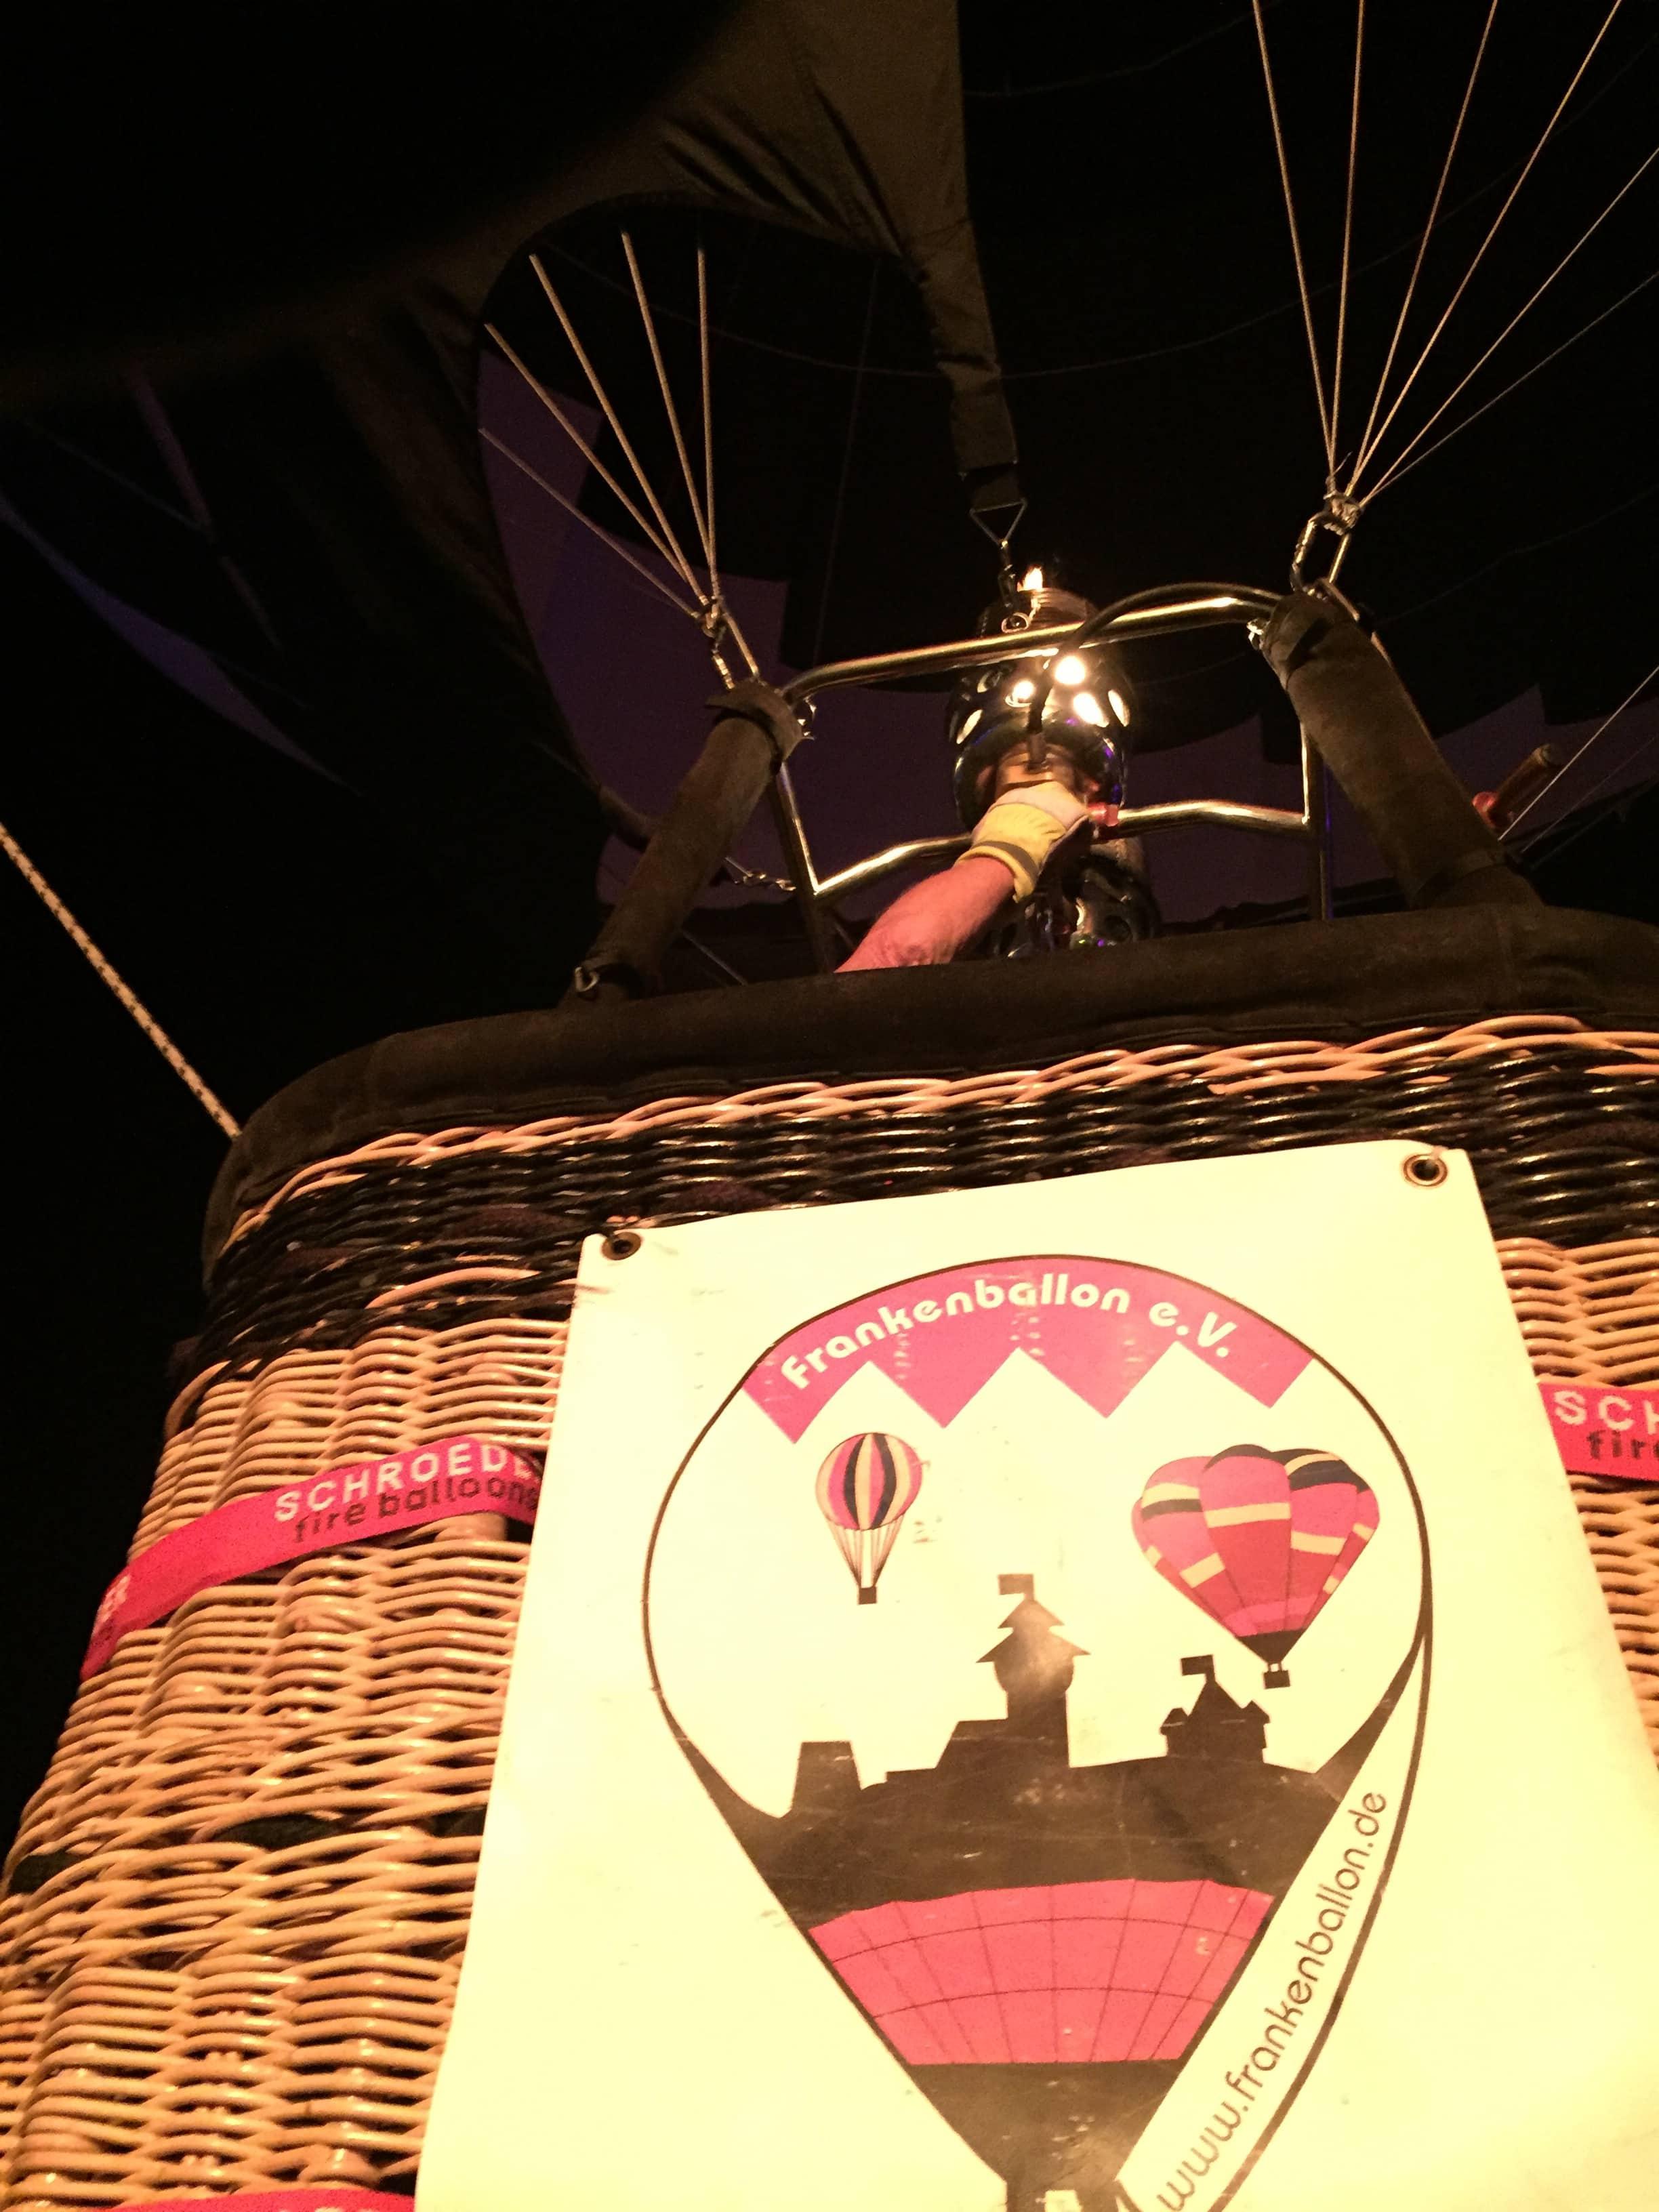 Ballonkorb mit Frankenballon-Logo